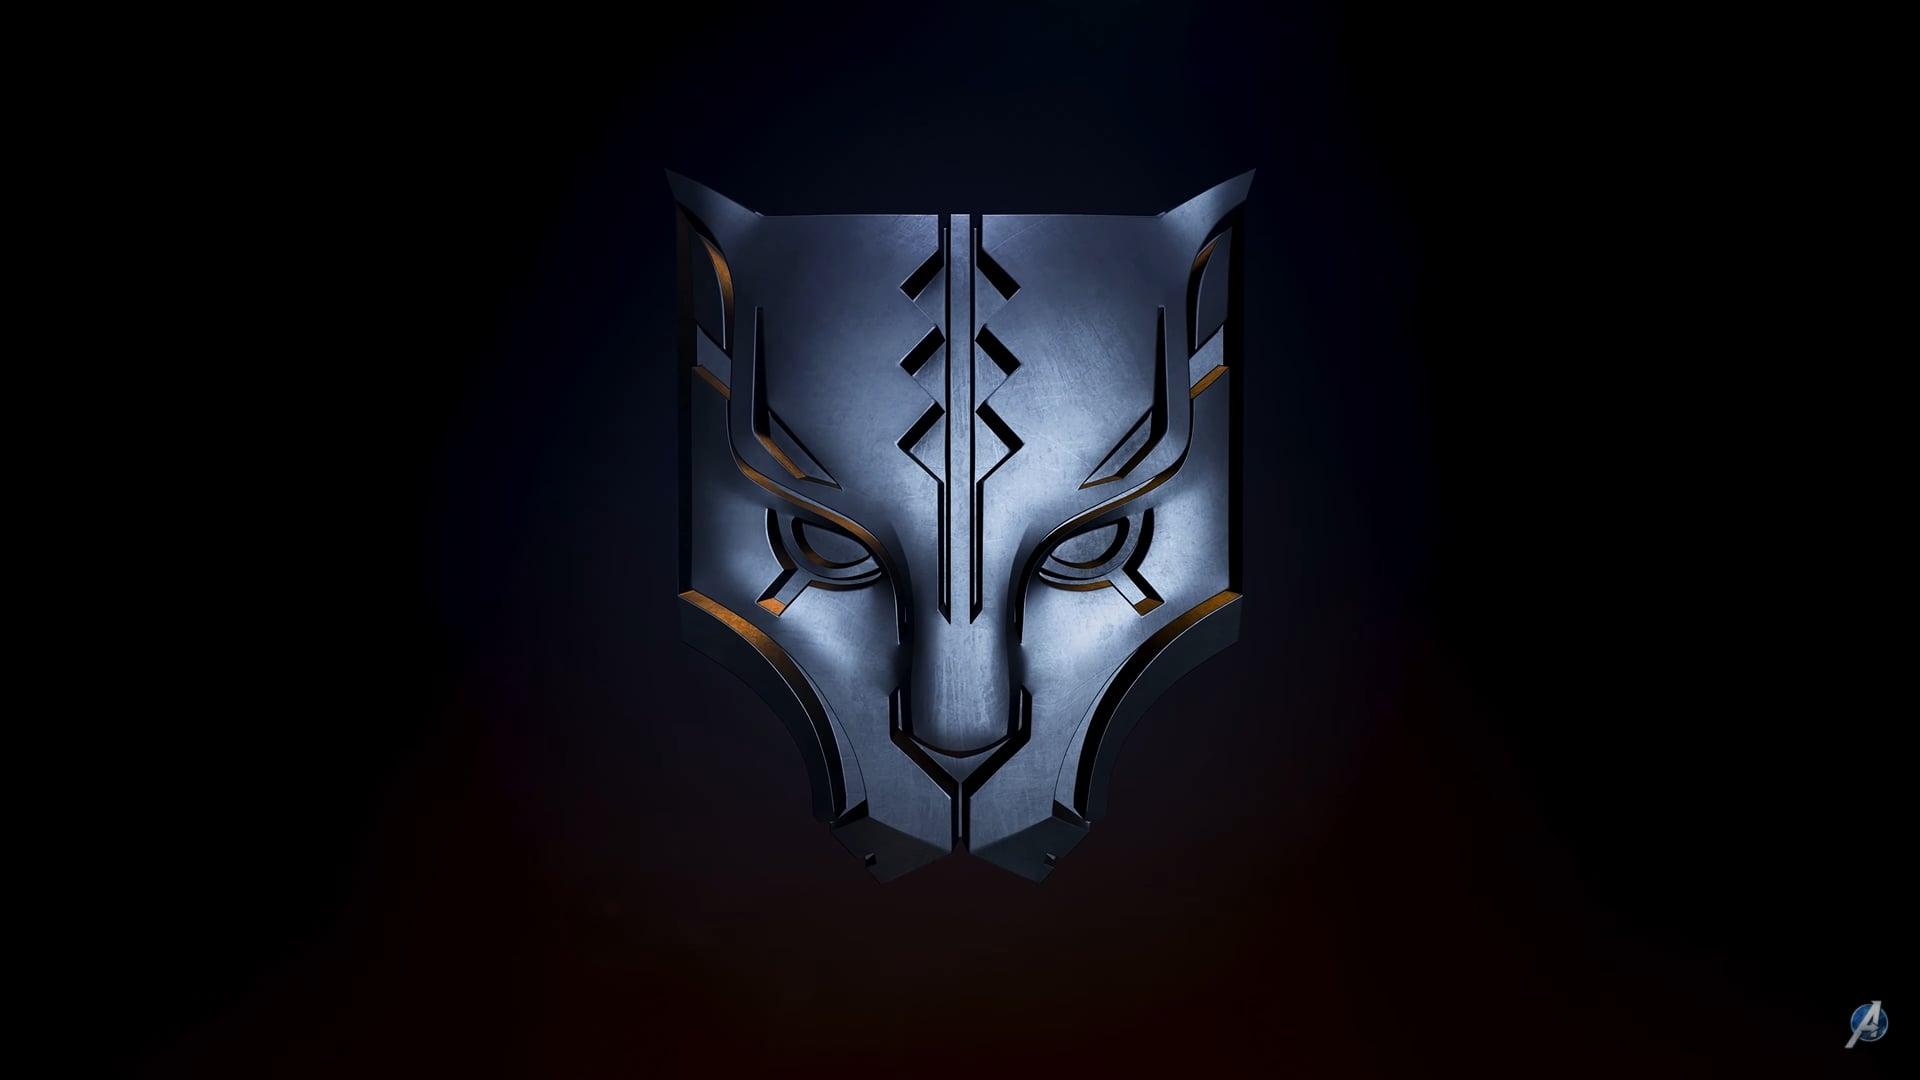 Marvel's Avengers Black Panther War for Wakanda Expansion